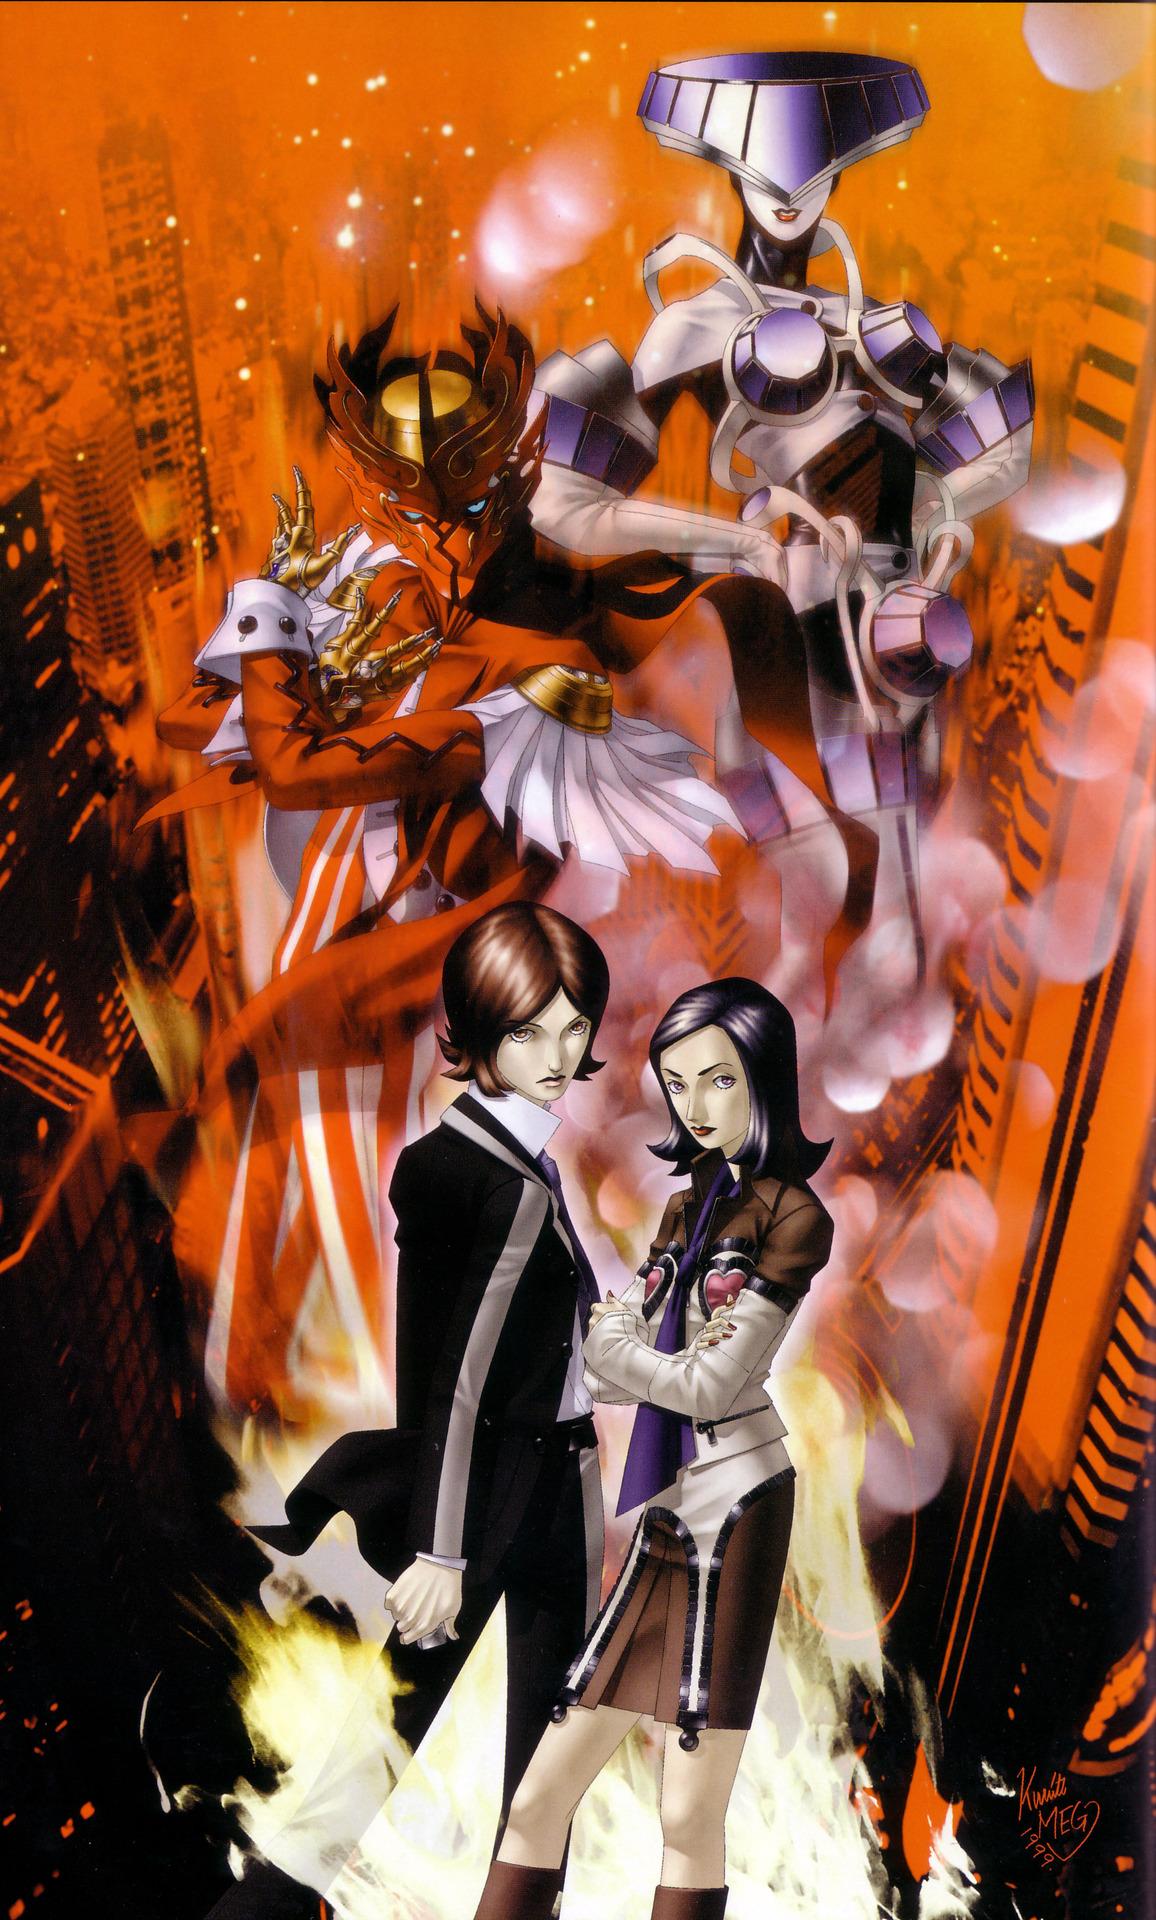 High Resolution Wallpaper | Persona 2: Eternal Punishment 1156x1920 px